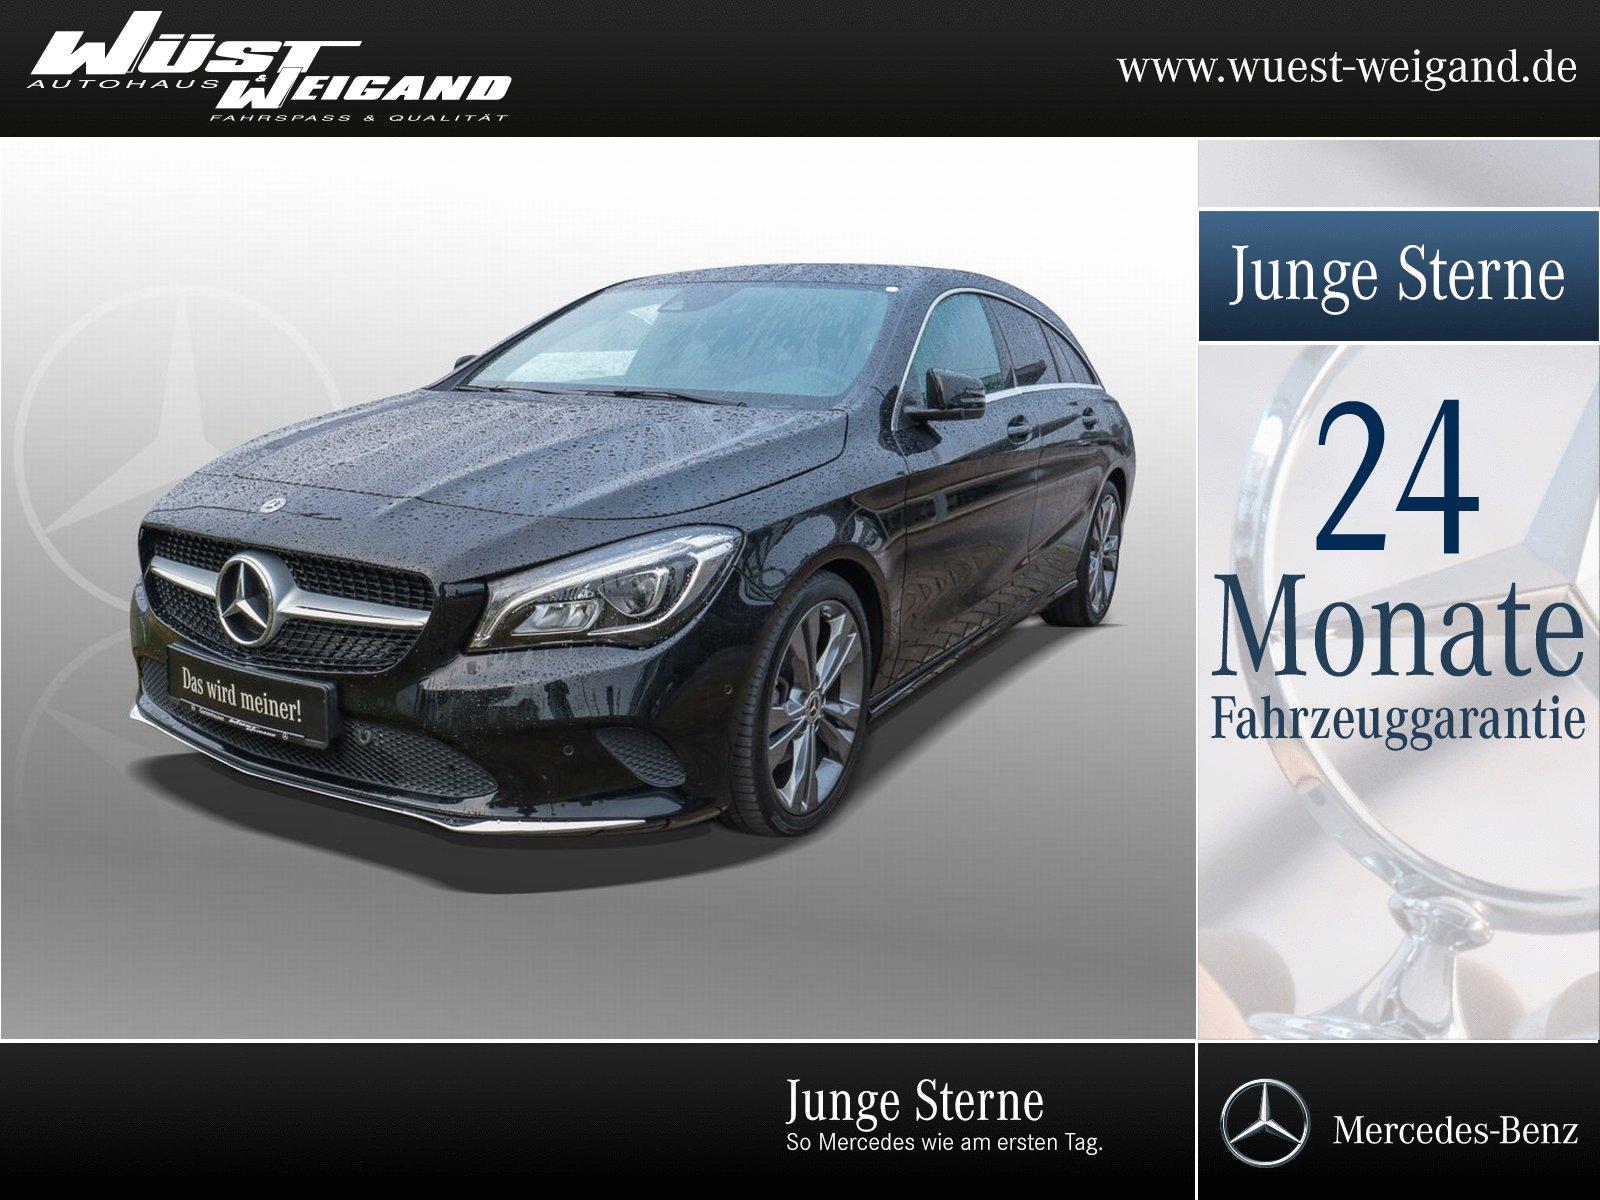 Mercedes-Benz CLA 180 SB Urban+Navi+LED+18Zoll+Navi+SHZ+PTS, Jahr 2017, Benzin